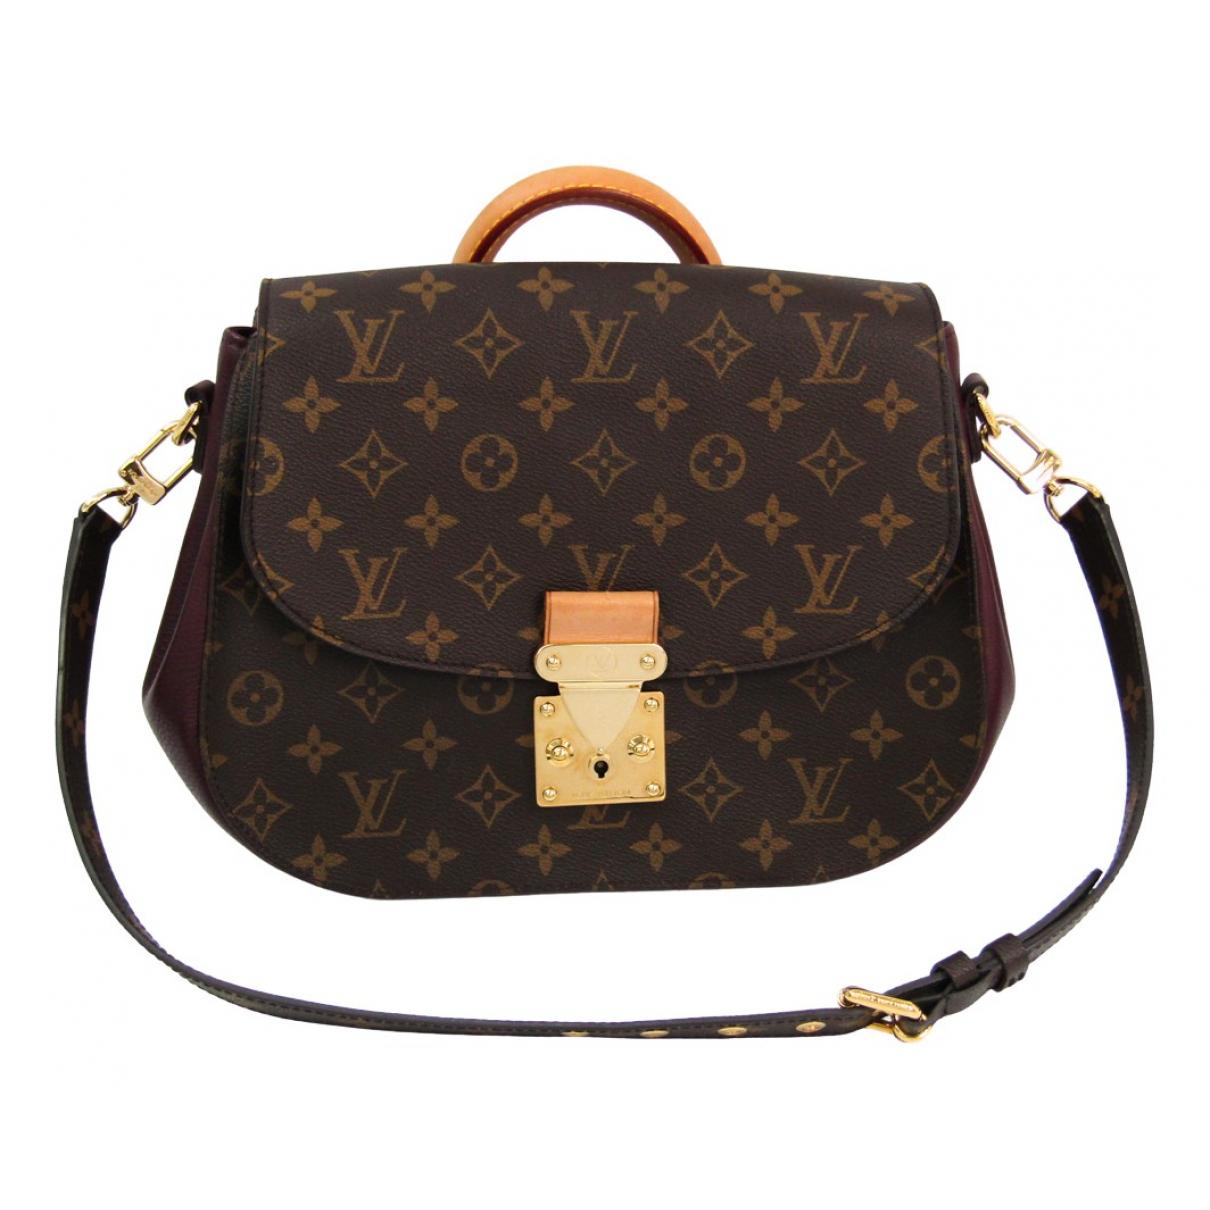 Louis Vuitton - Sac a main Eden pour femme en toile - marron